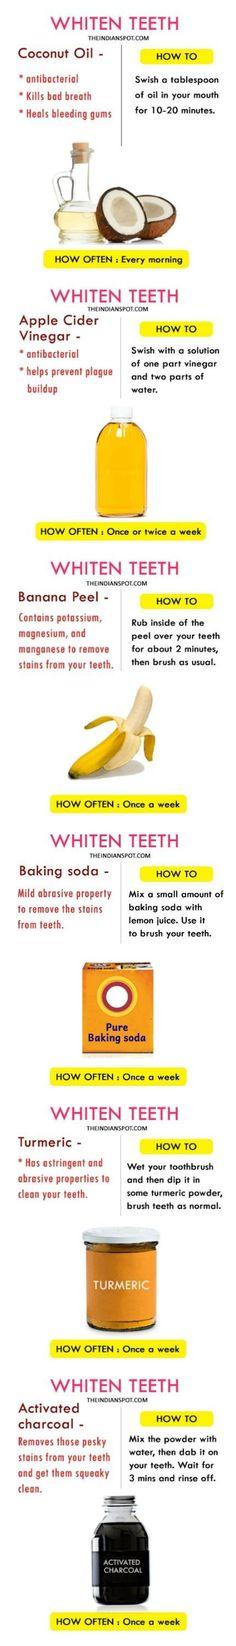 Whiten teeth recipe.